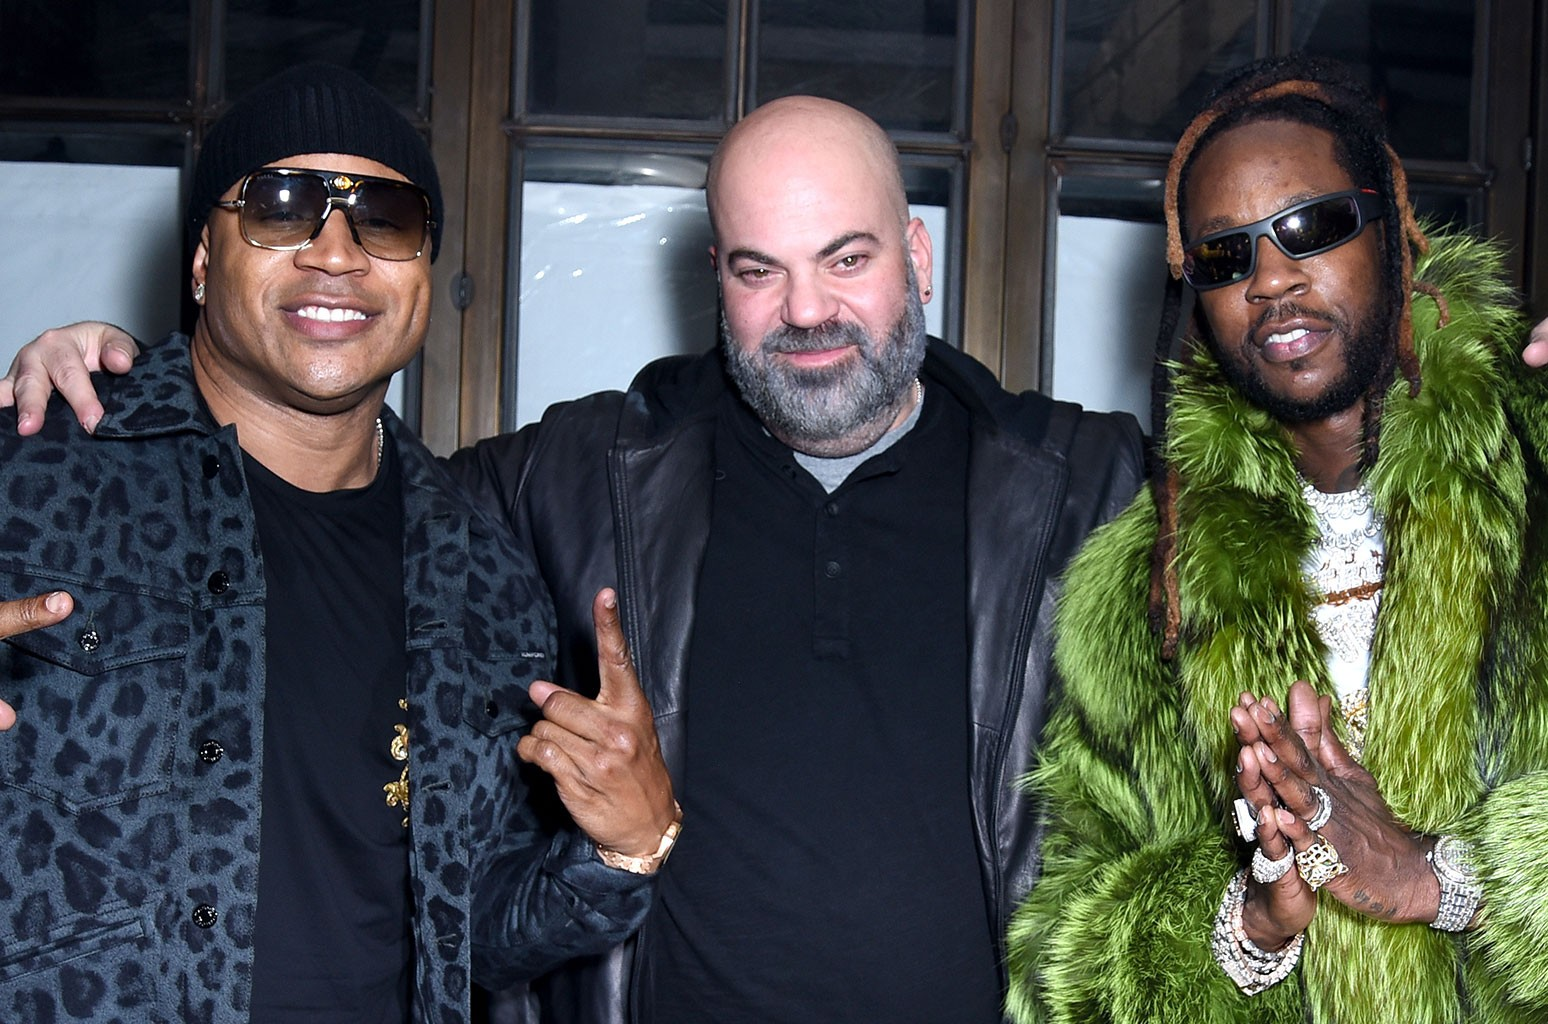 LL Cool J, Paul Rosenberg and 2 Chainz